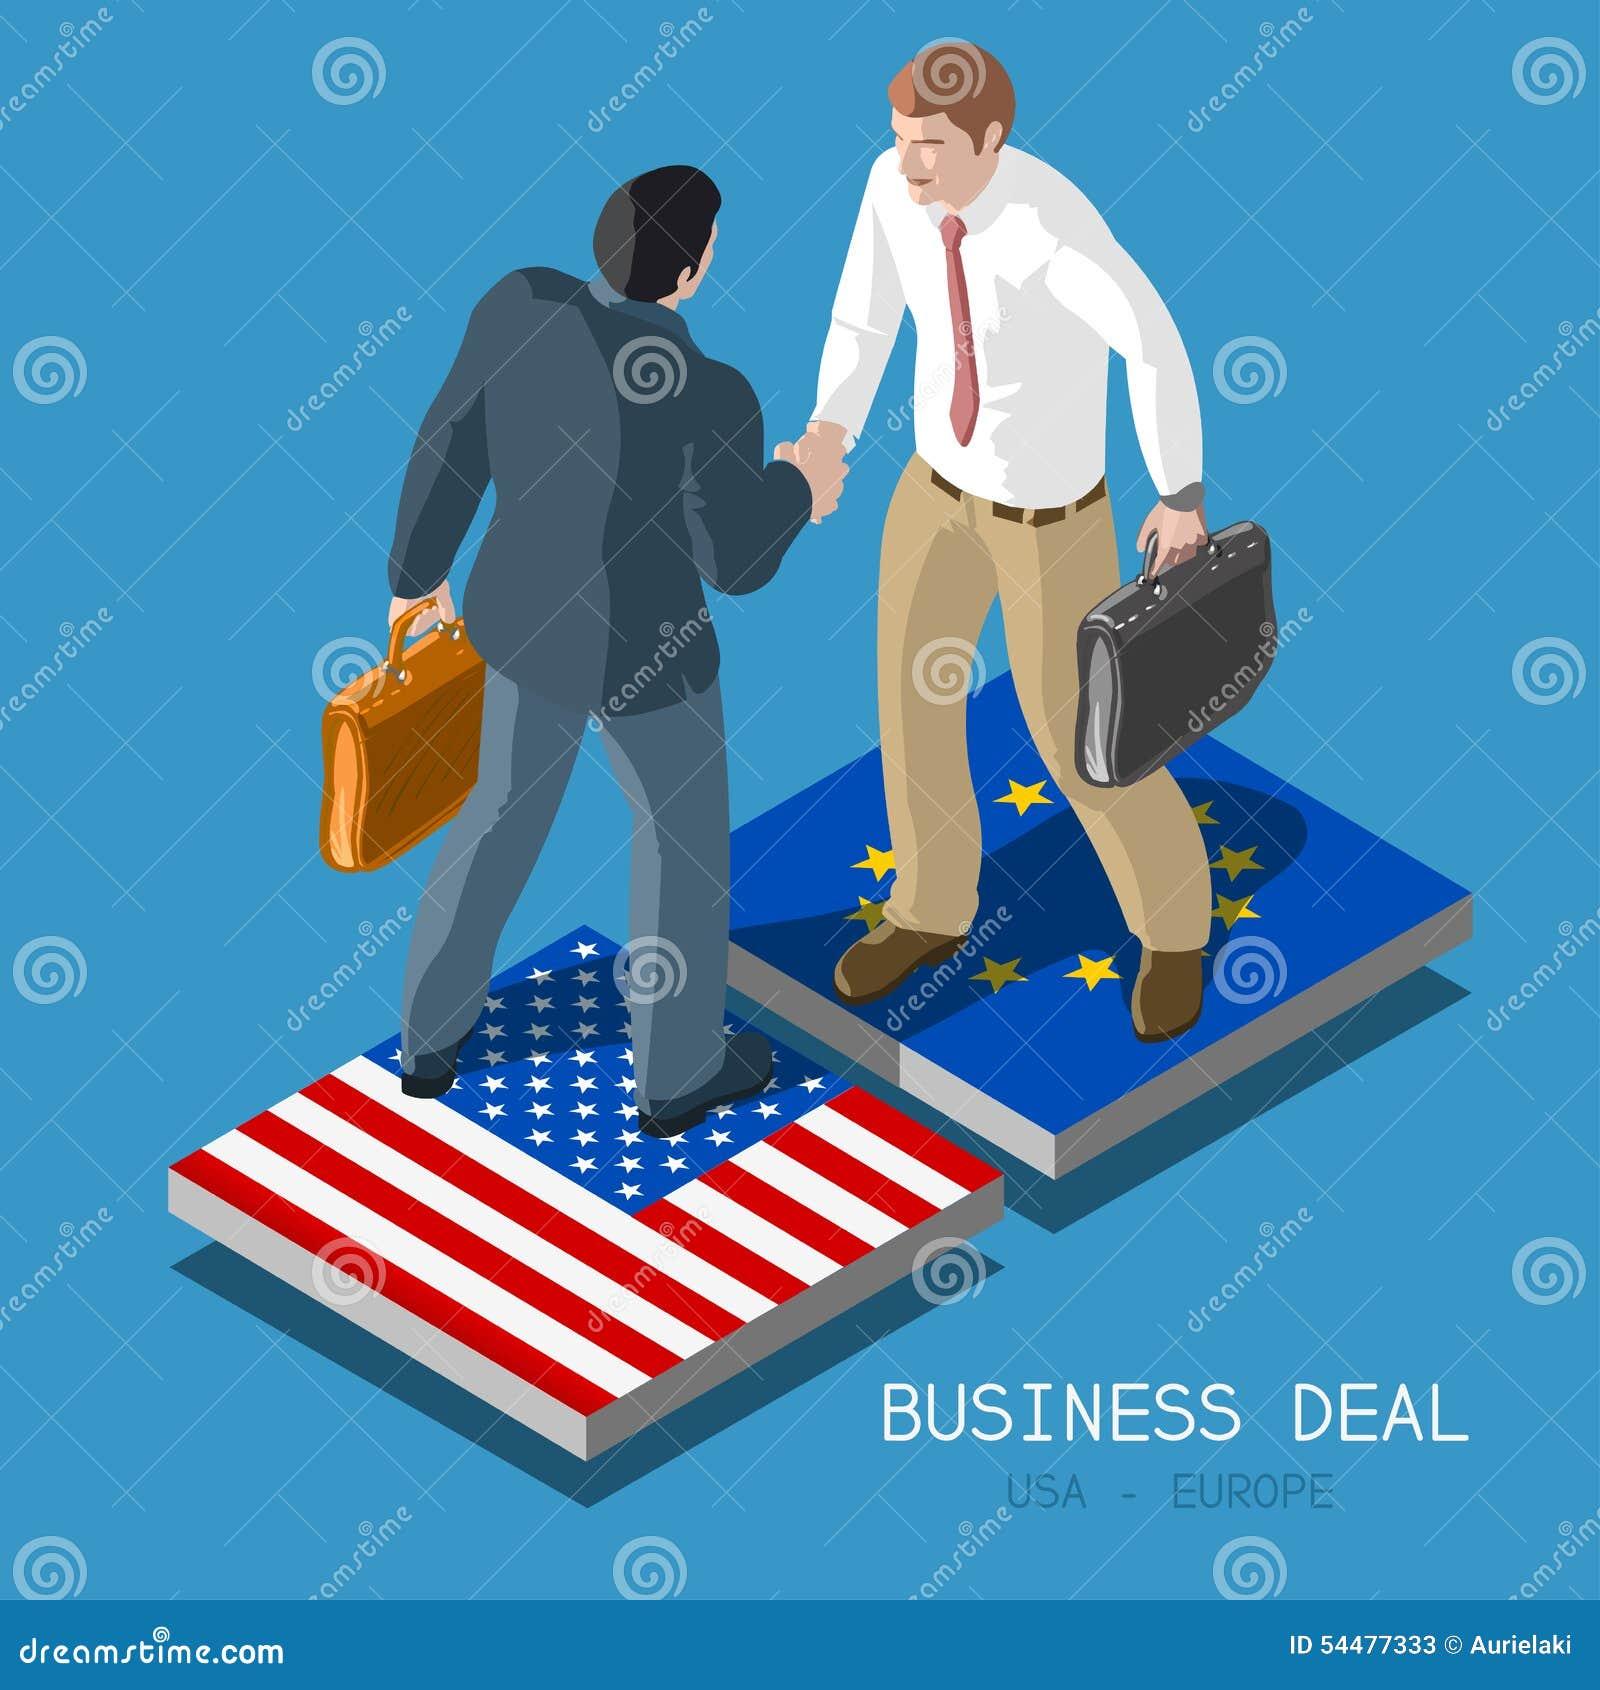 Best deals usa to europe